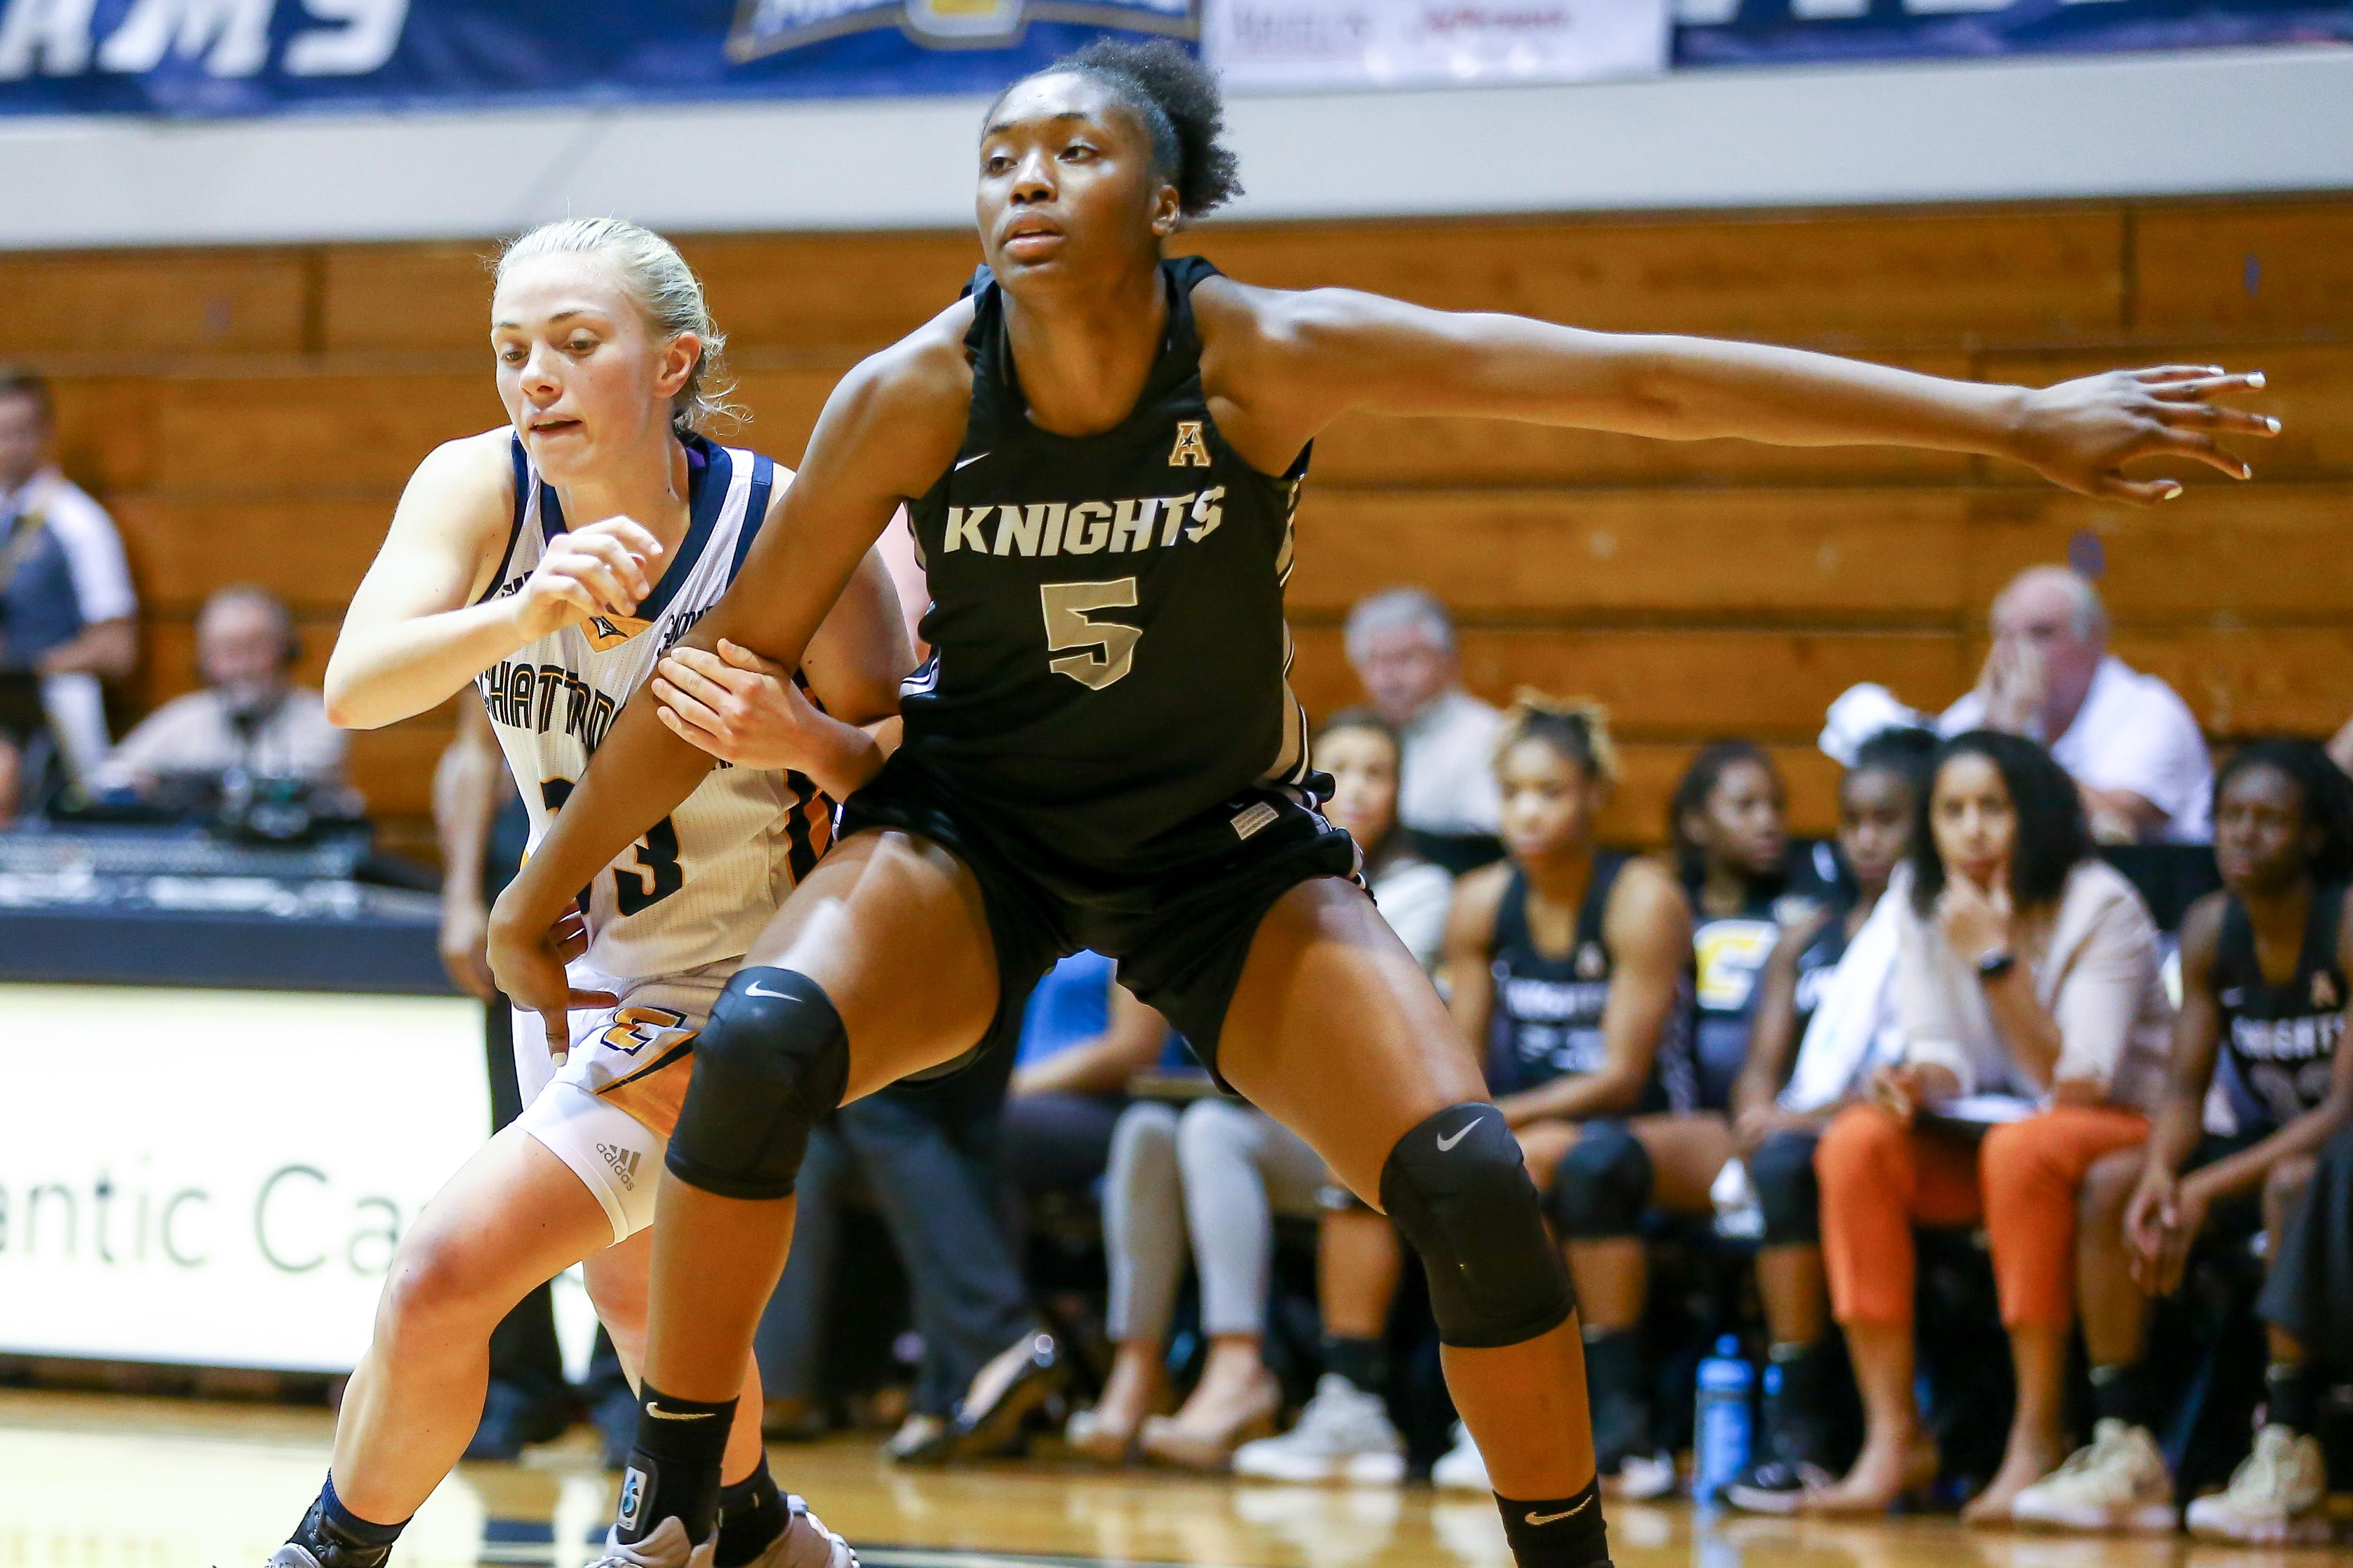 COLLEGE BASKETBALL: NOV 13 Women's - UCF at UT-Chattanooga